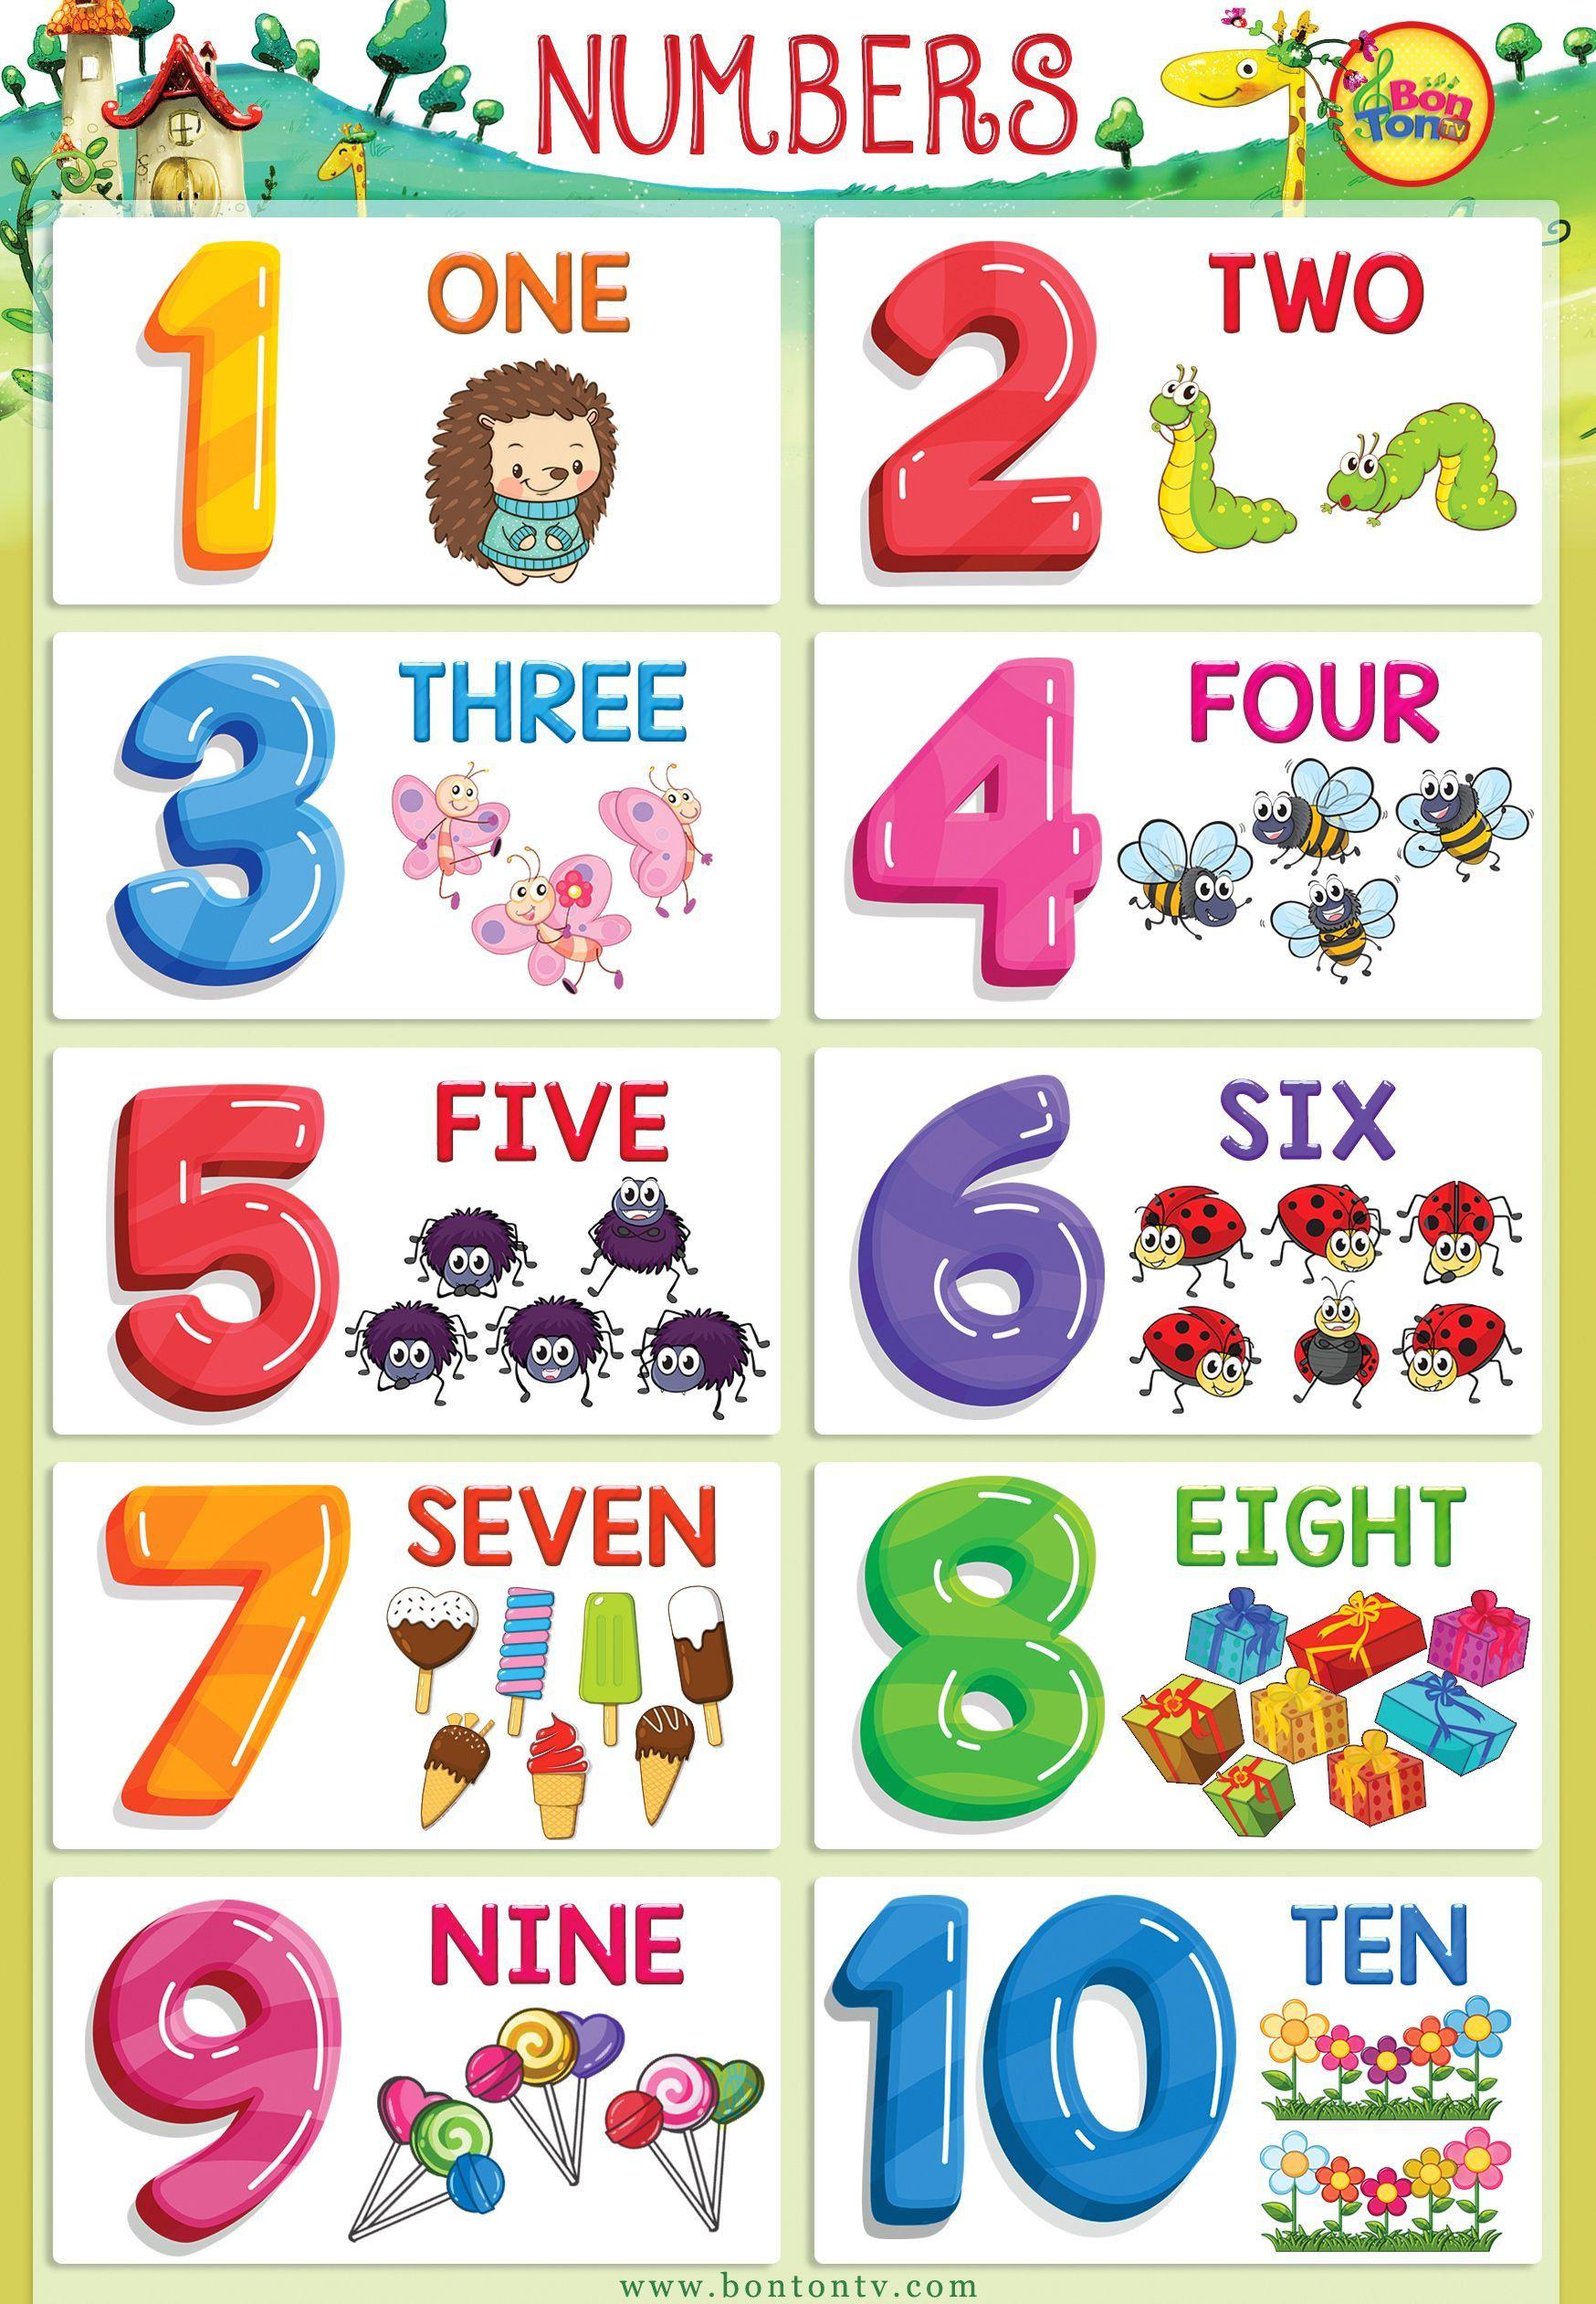 4 Spanish Numbers 1 20 Worksheet In 2020 Learning Numbers Preschool Numbers Preschool Printables Numbers Preschool